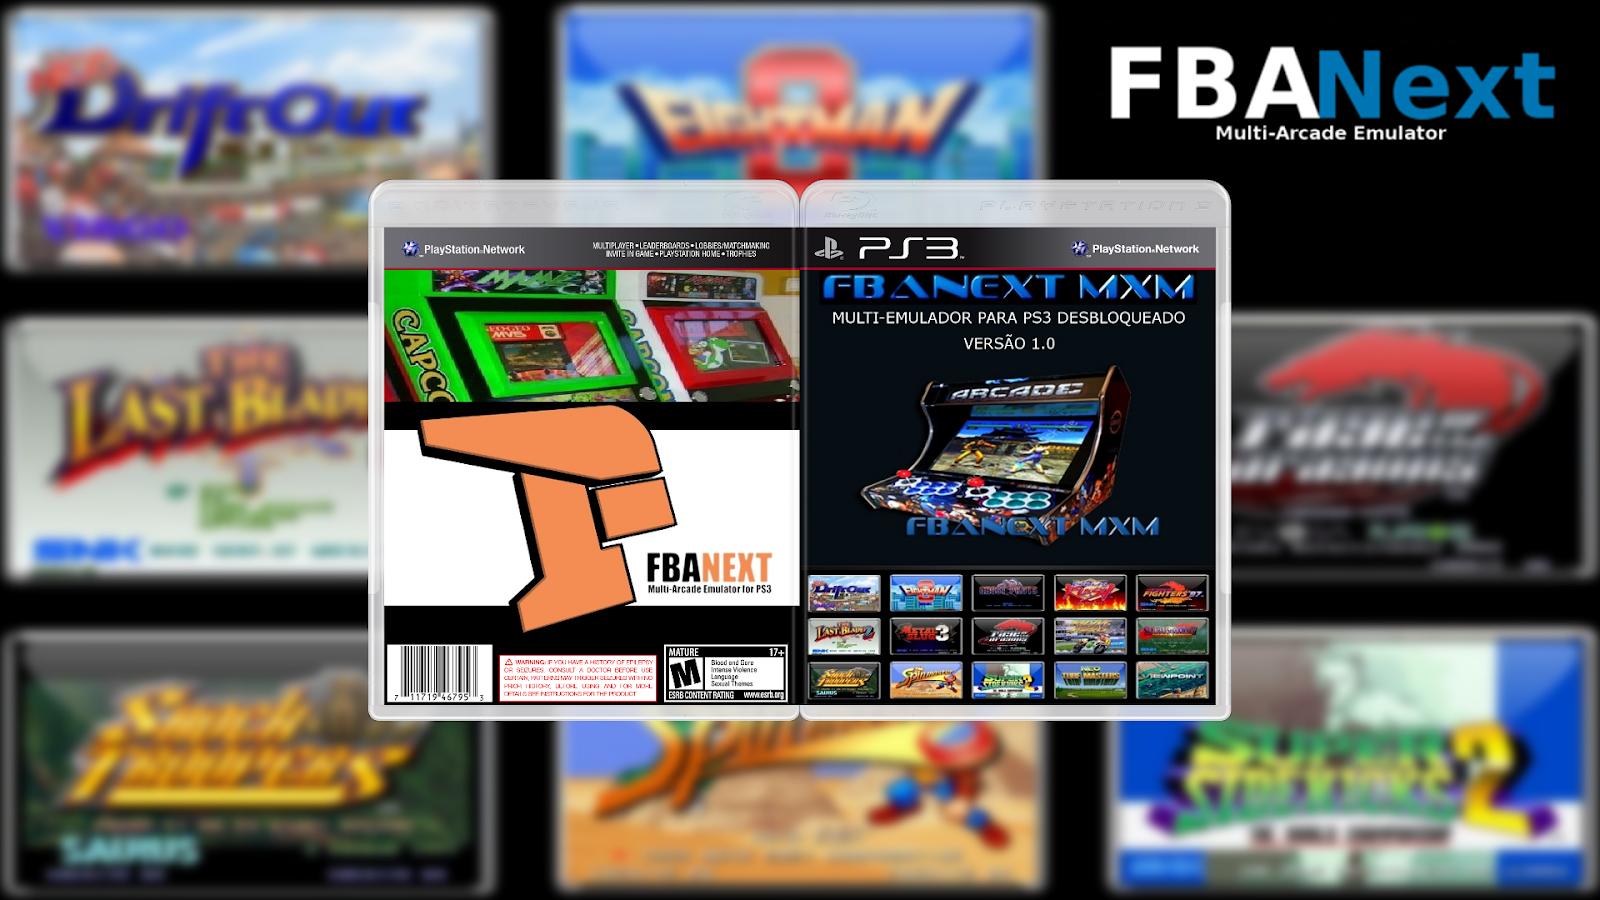 GAMES AND GAMERS: EMULADOR FBANEXT MXM 1 0 PS3 DOWNLOAD